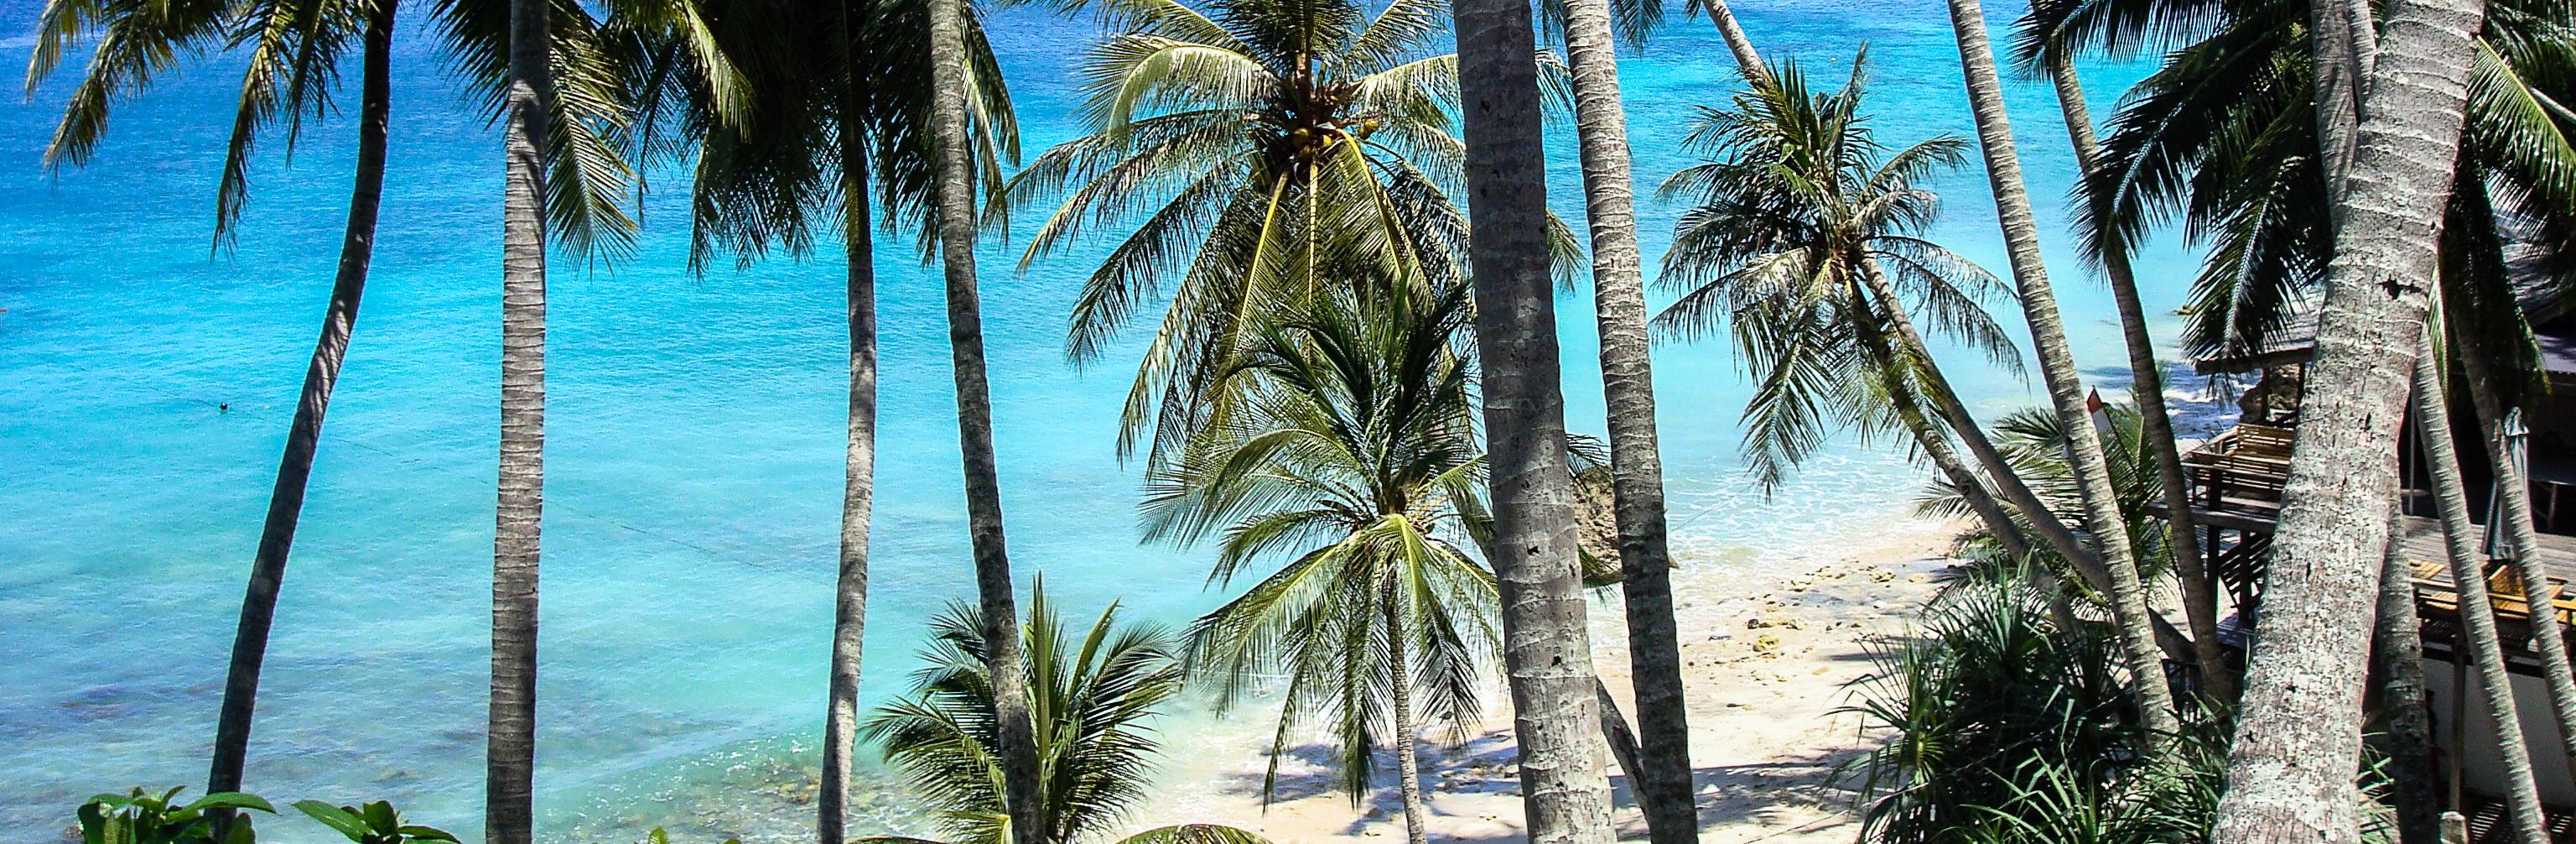 Pulau Weh-9